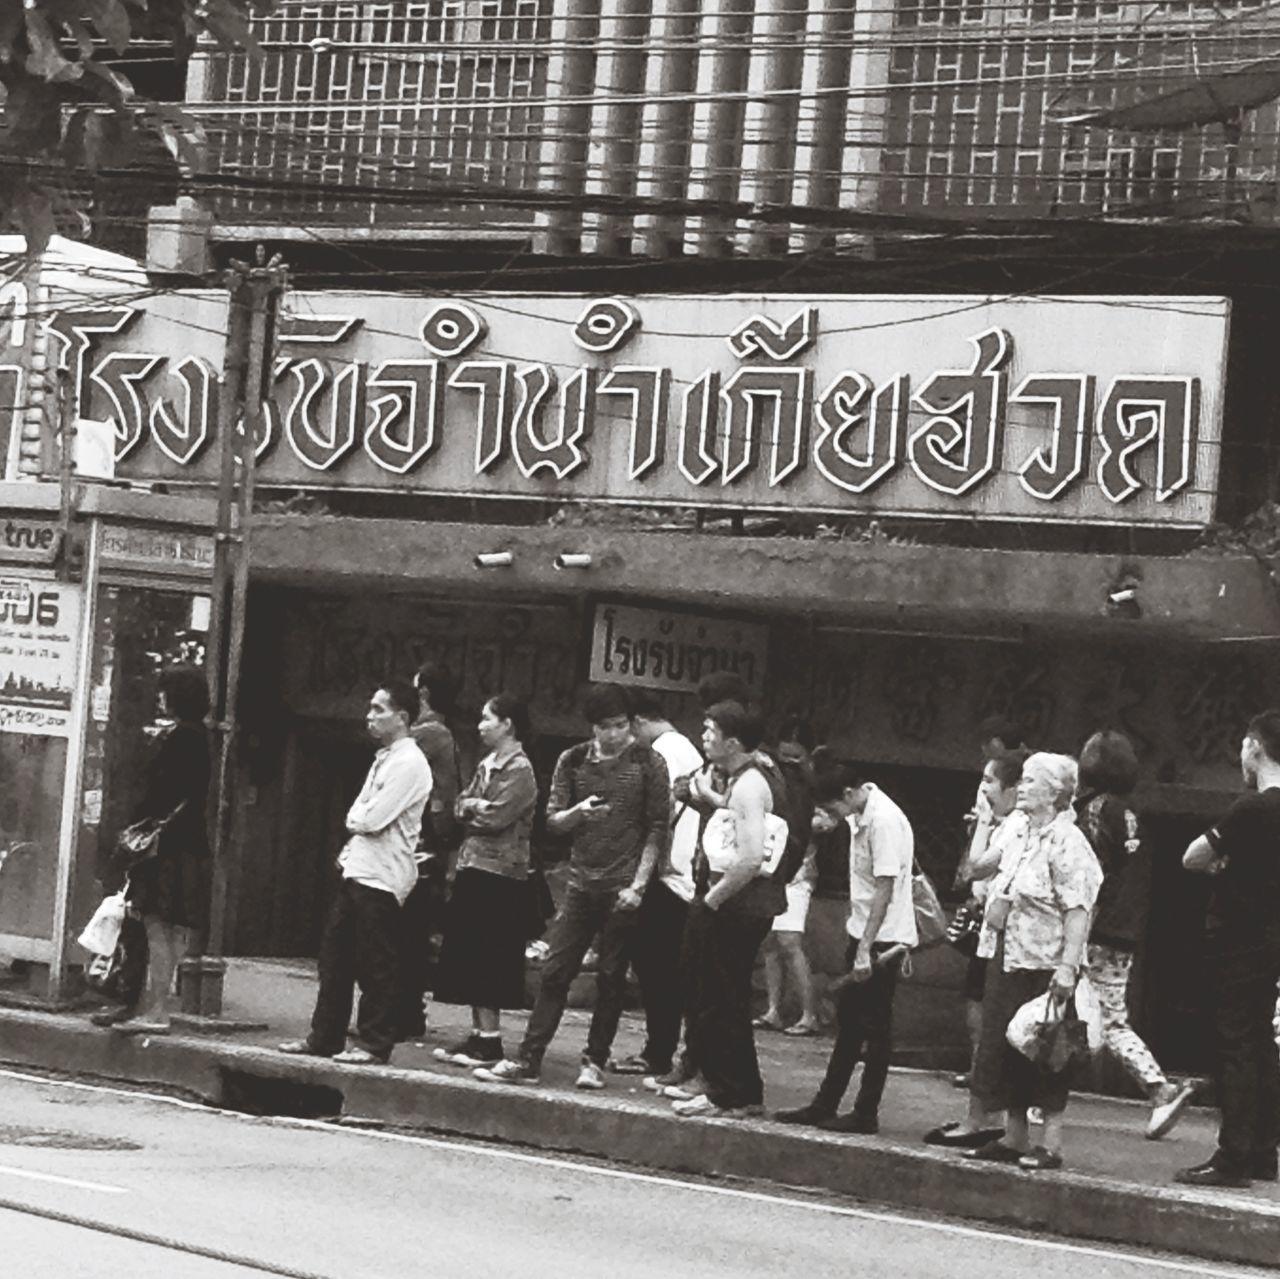 Street Photography m Street Photo Black & White Monochrome